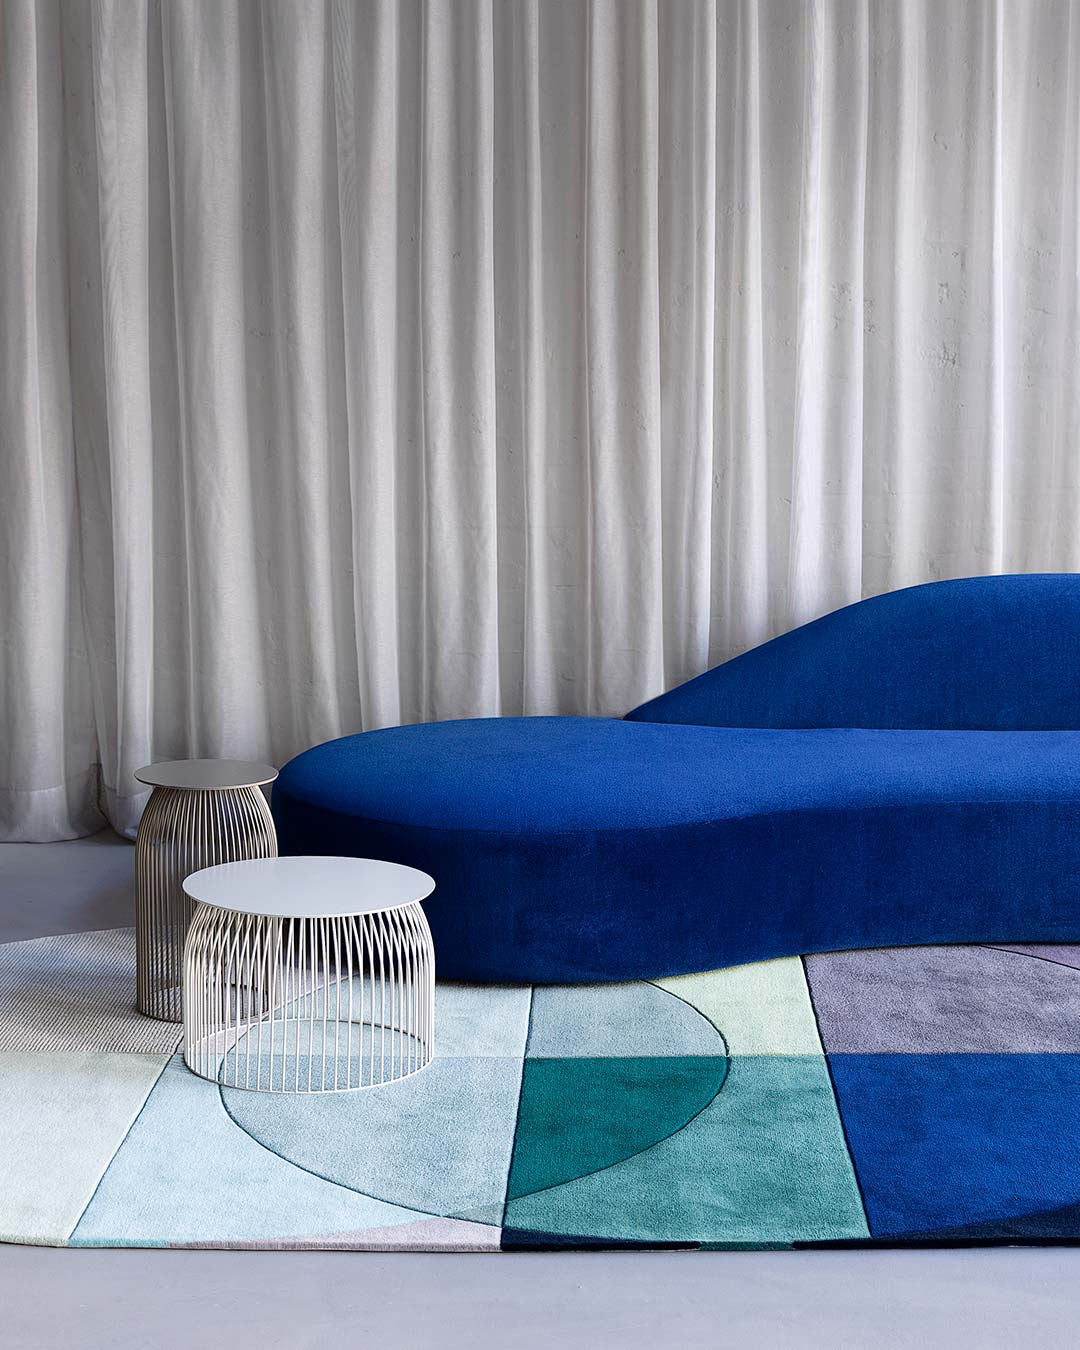 location living room shot of ocean rug by bernabeifreeman blue green